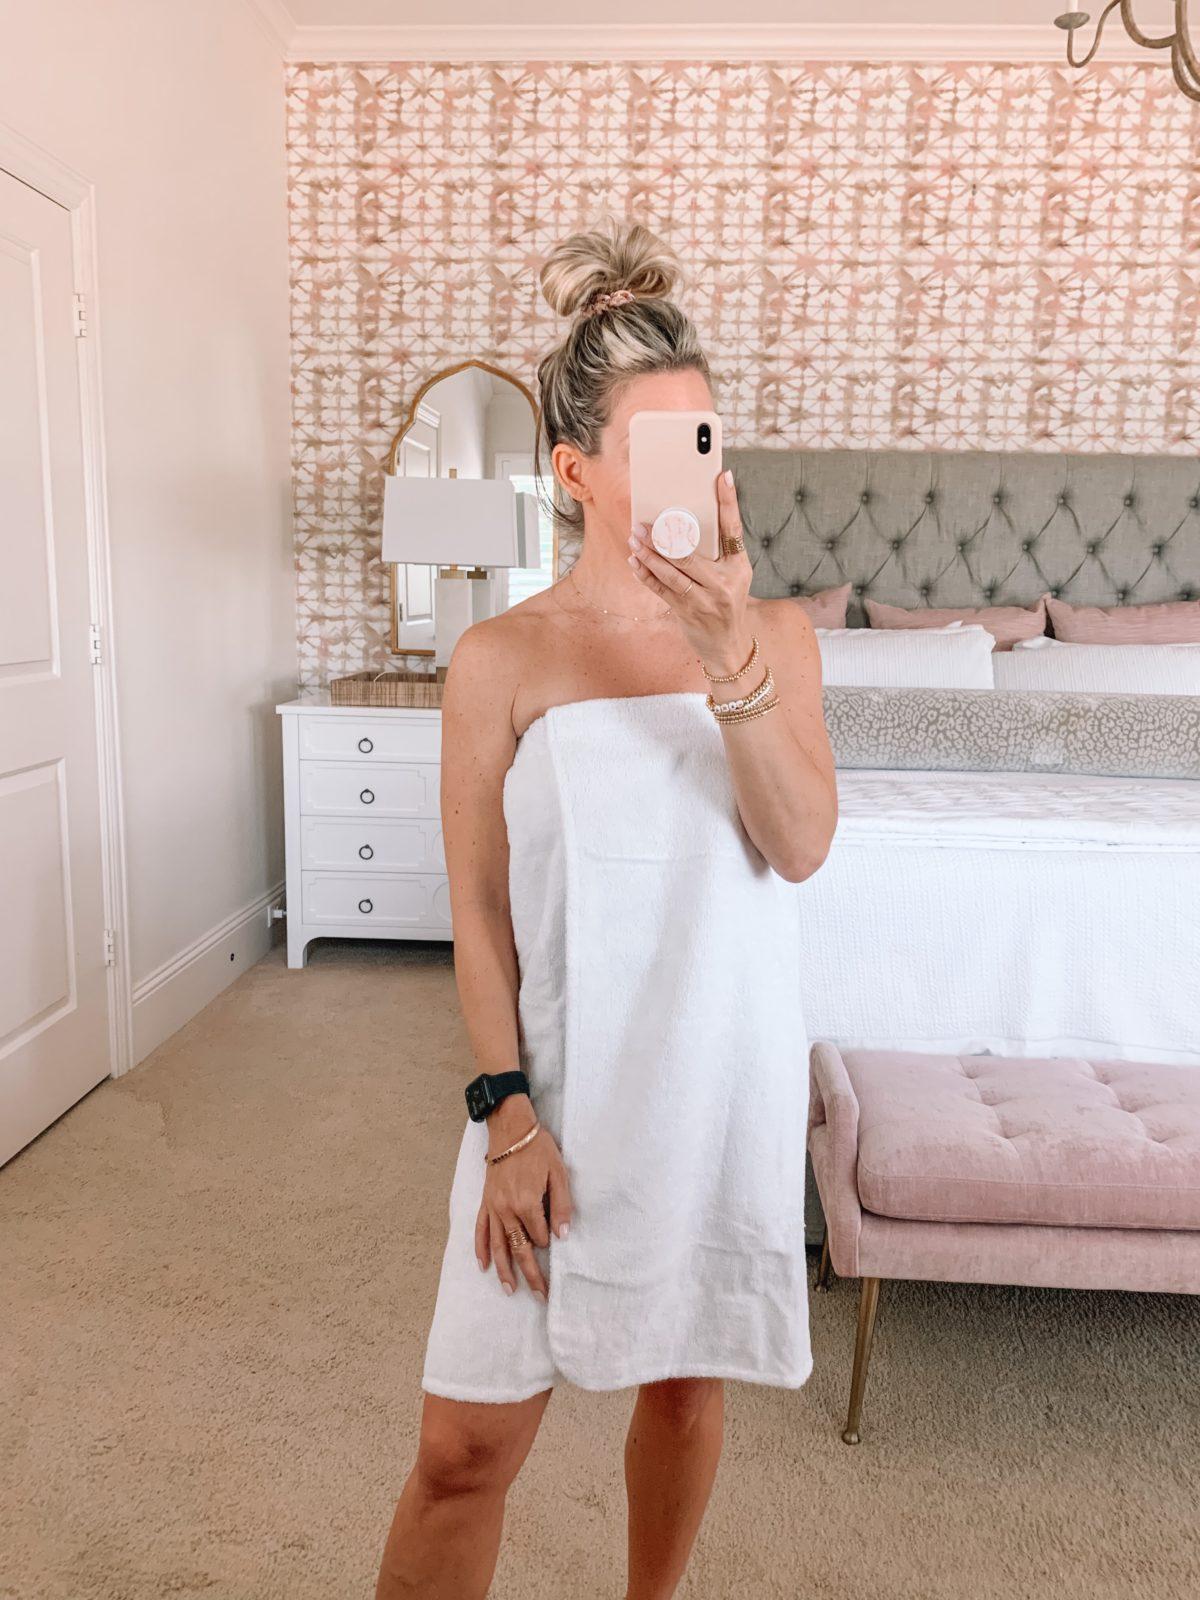 Amazon Women's Towel Wrap